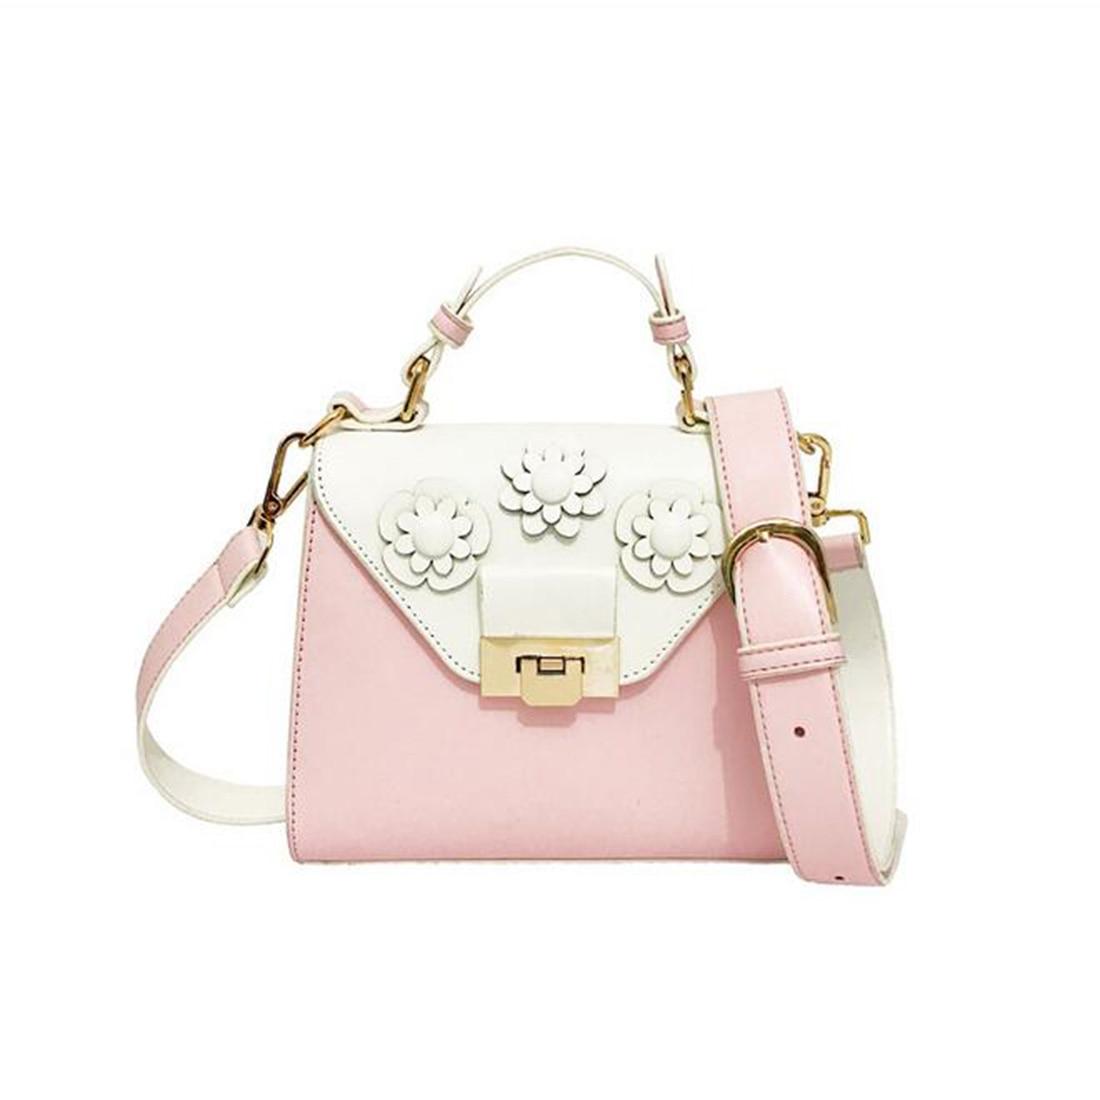 YEJIA FASHION Appliques Luxury Handbag Women Bag Fresh Style Summer Beach Women